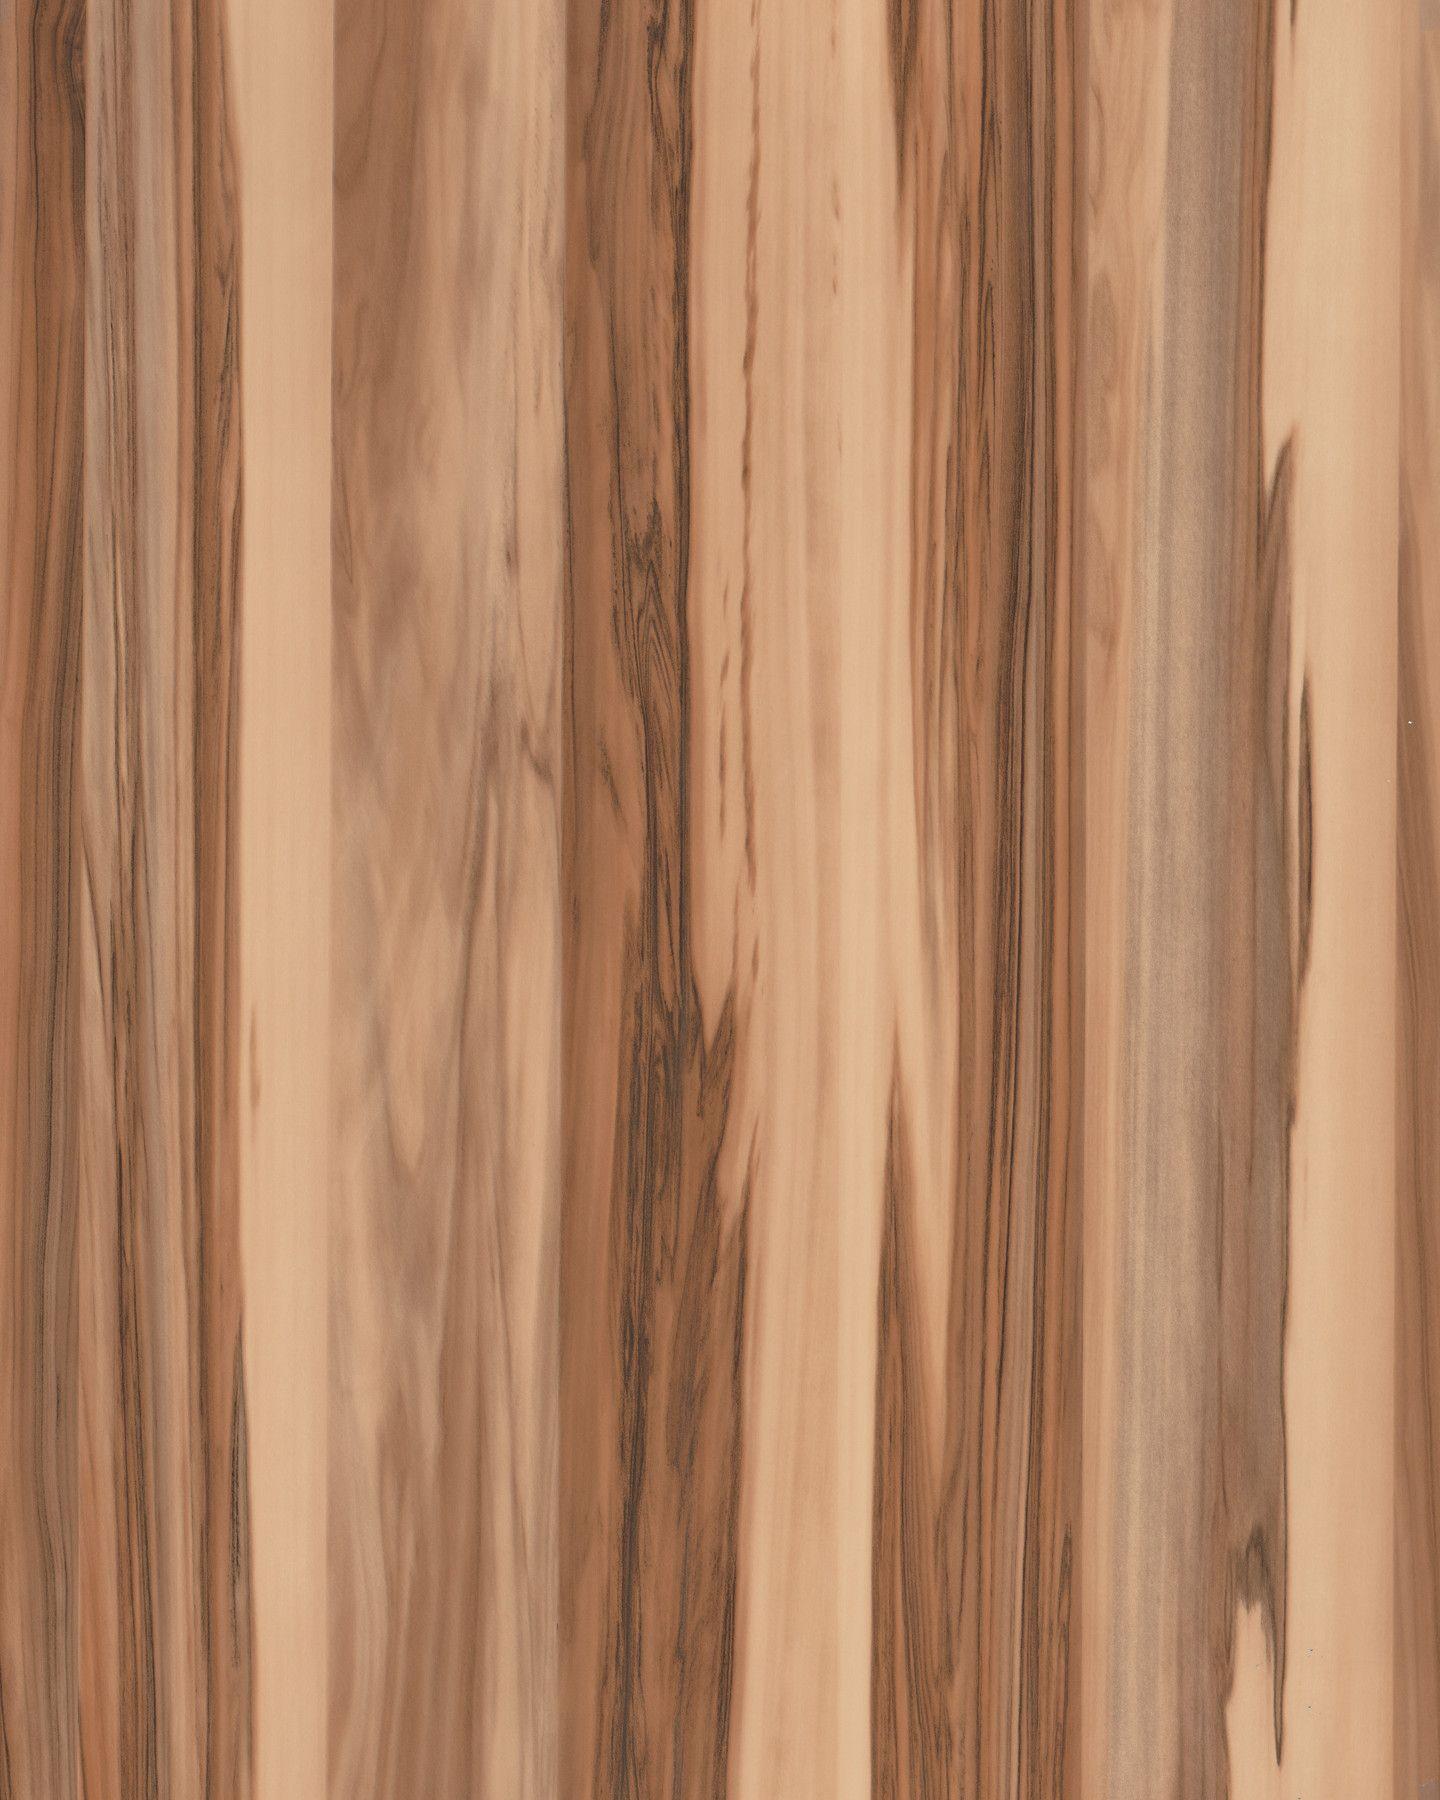 Dc Fix Stripe Walnut Adhesive Film Wall Decal Sticky Back Plastic Wood Worktop Decorative Film